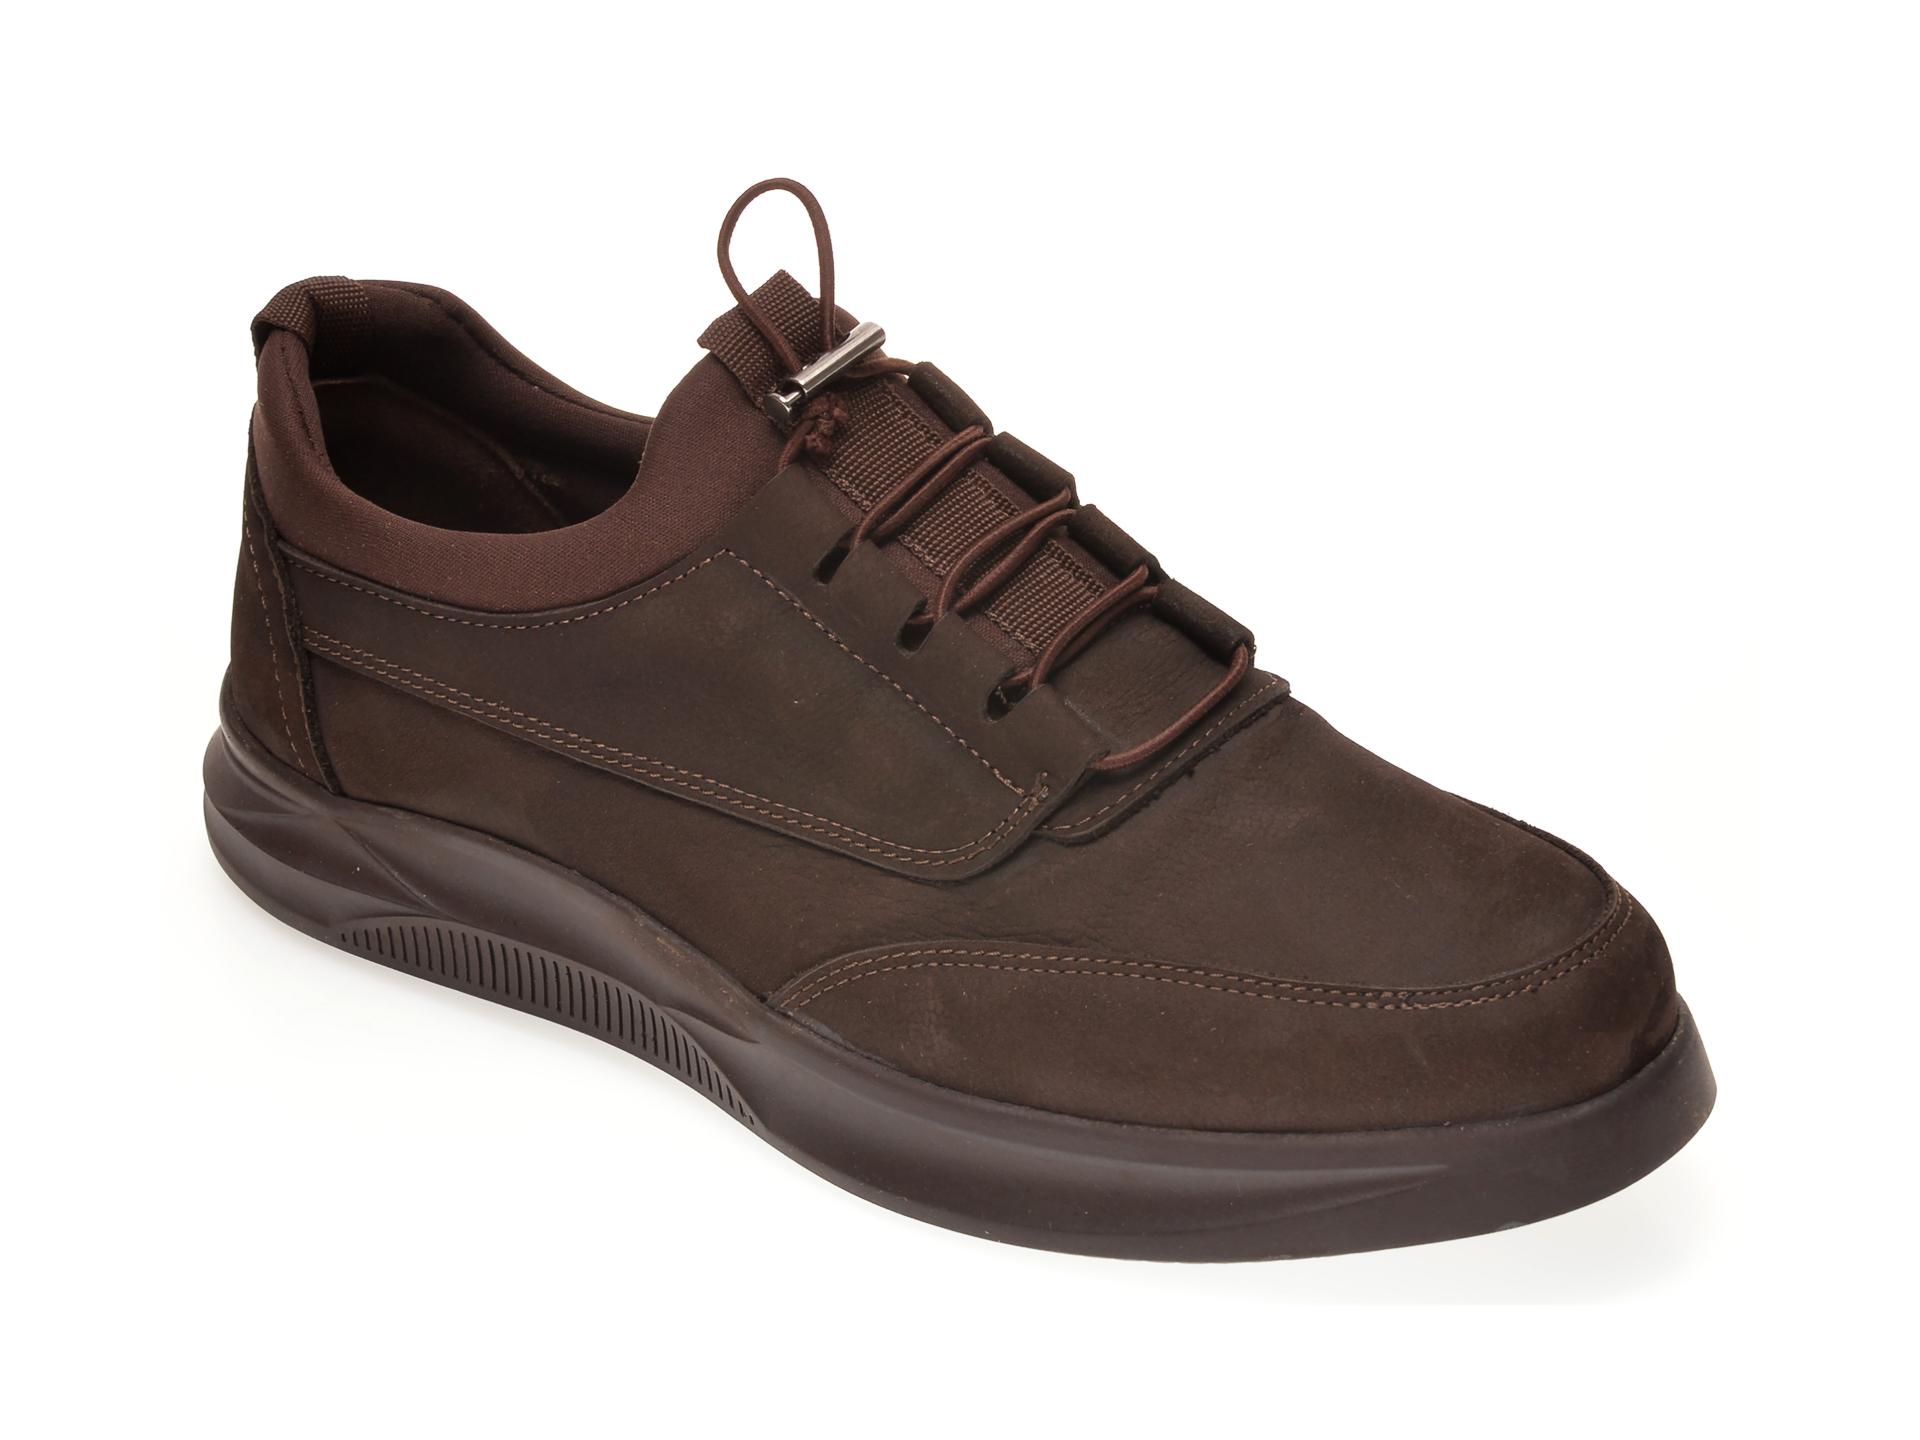 Pantofi OTTER maro, M5790, din nabuc New